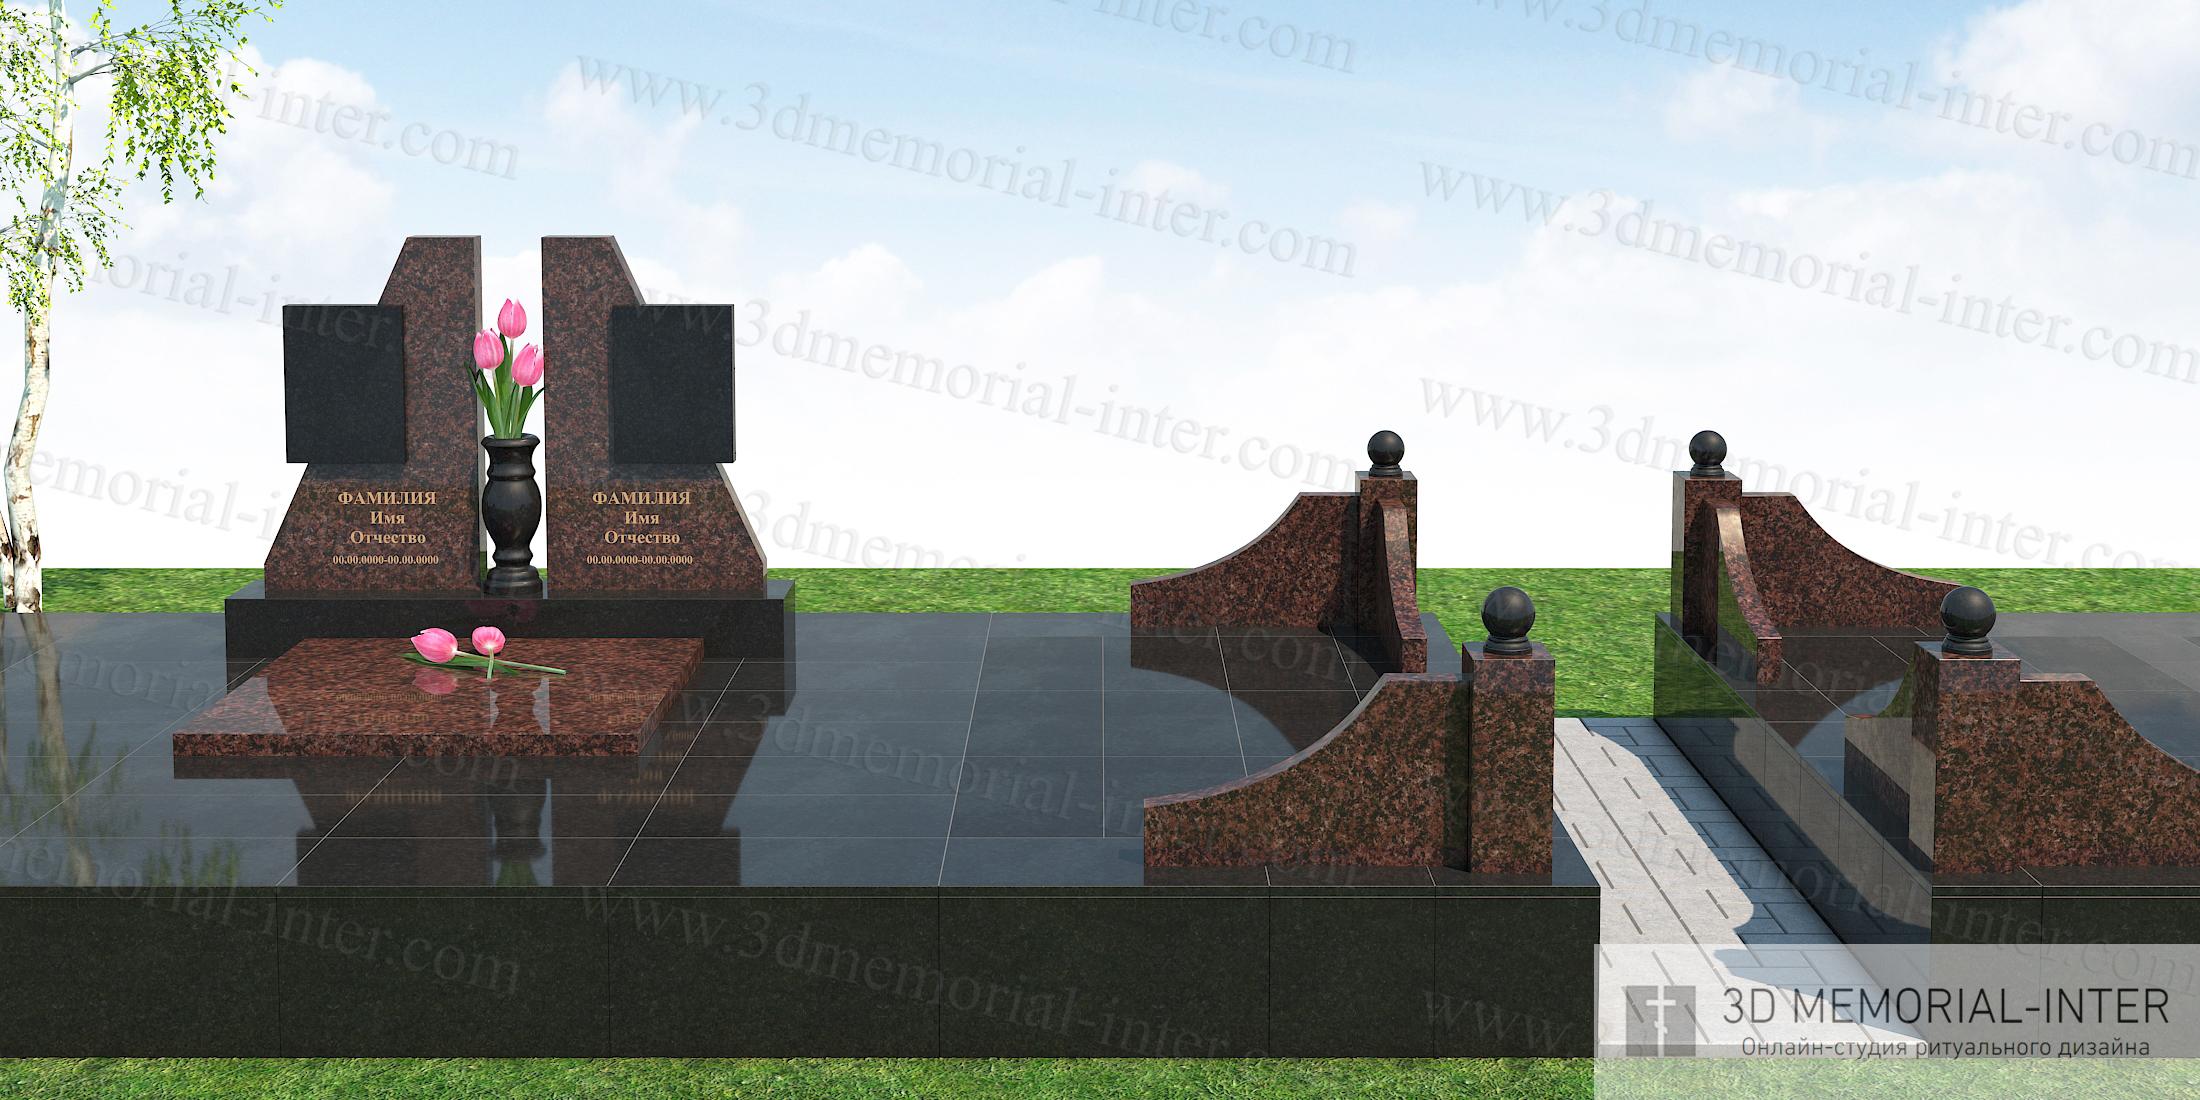 Студия 3d memorial-inter